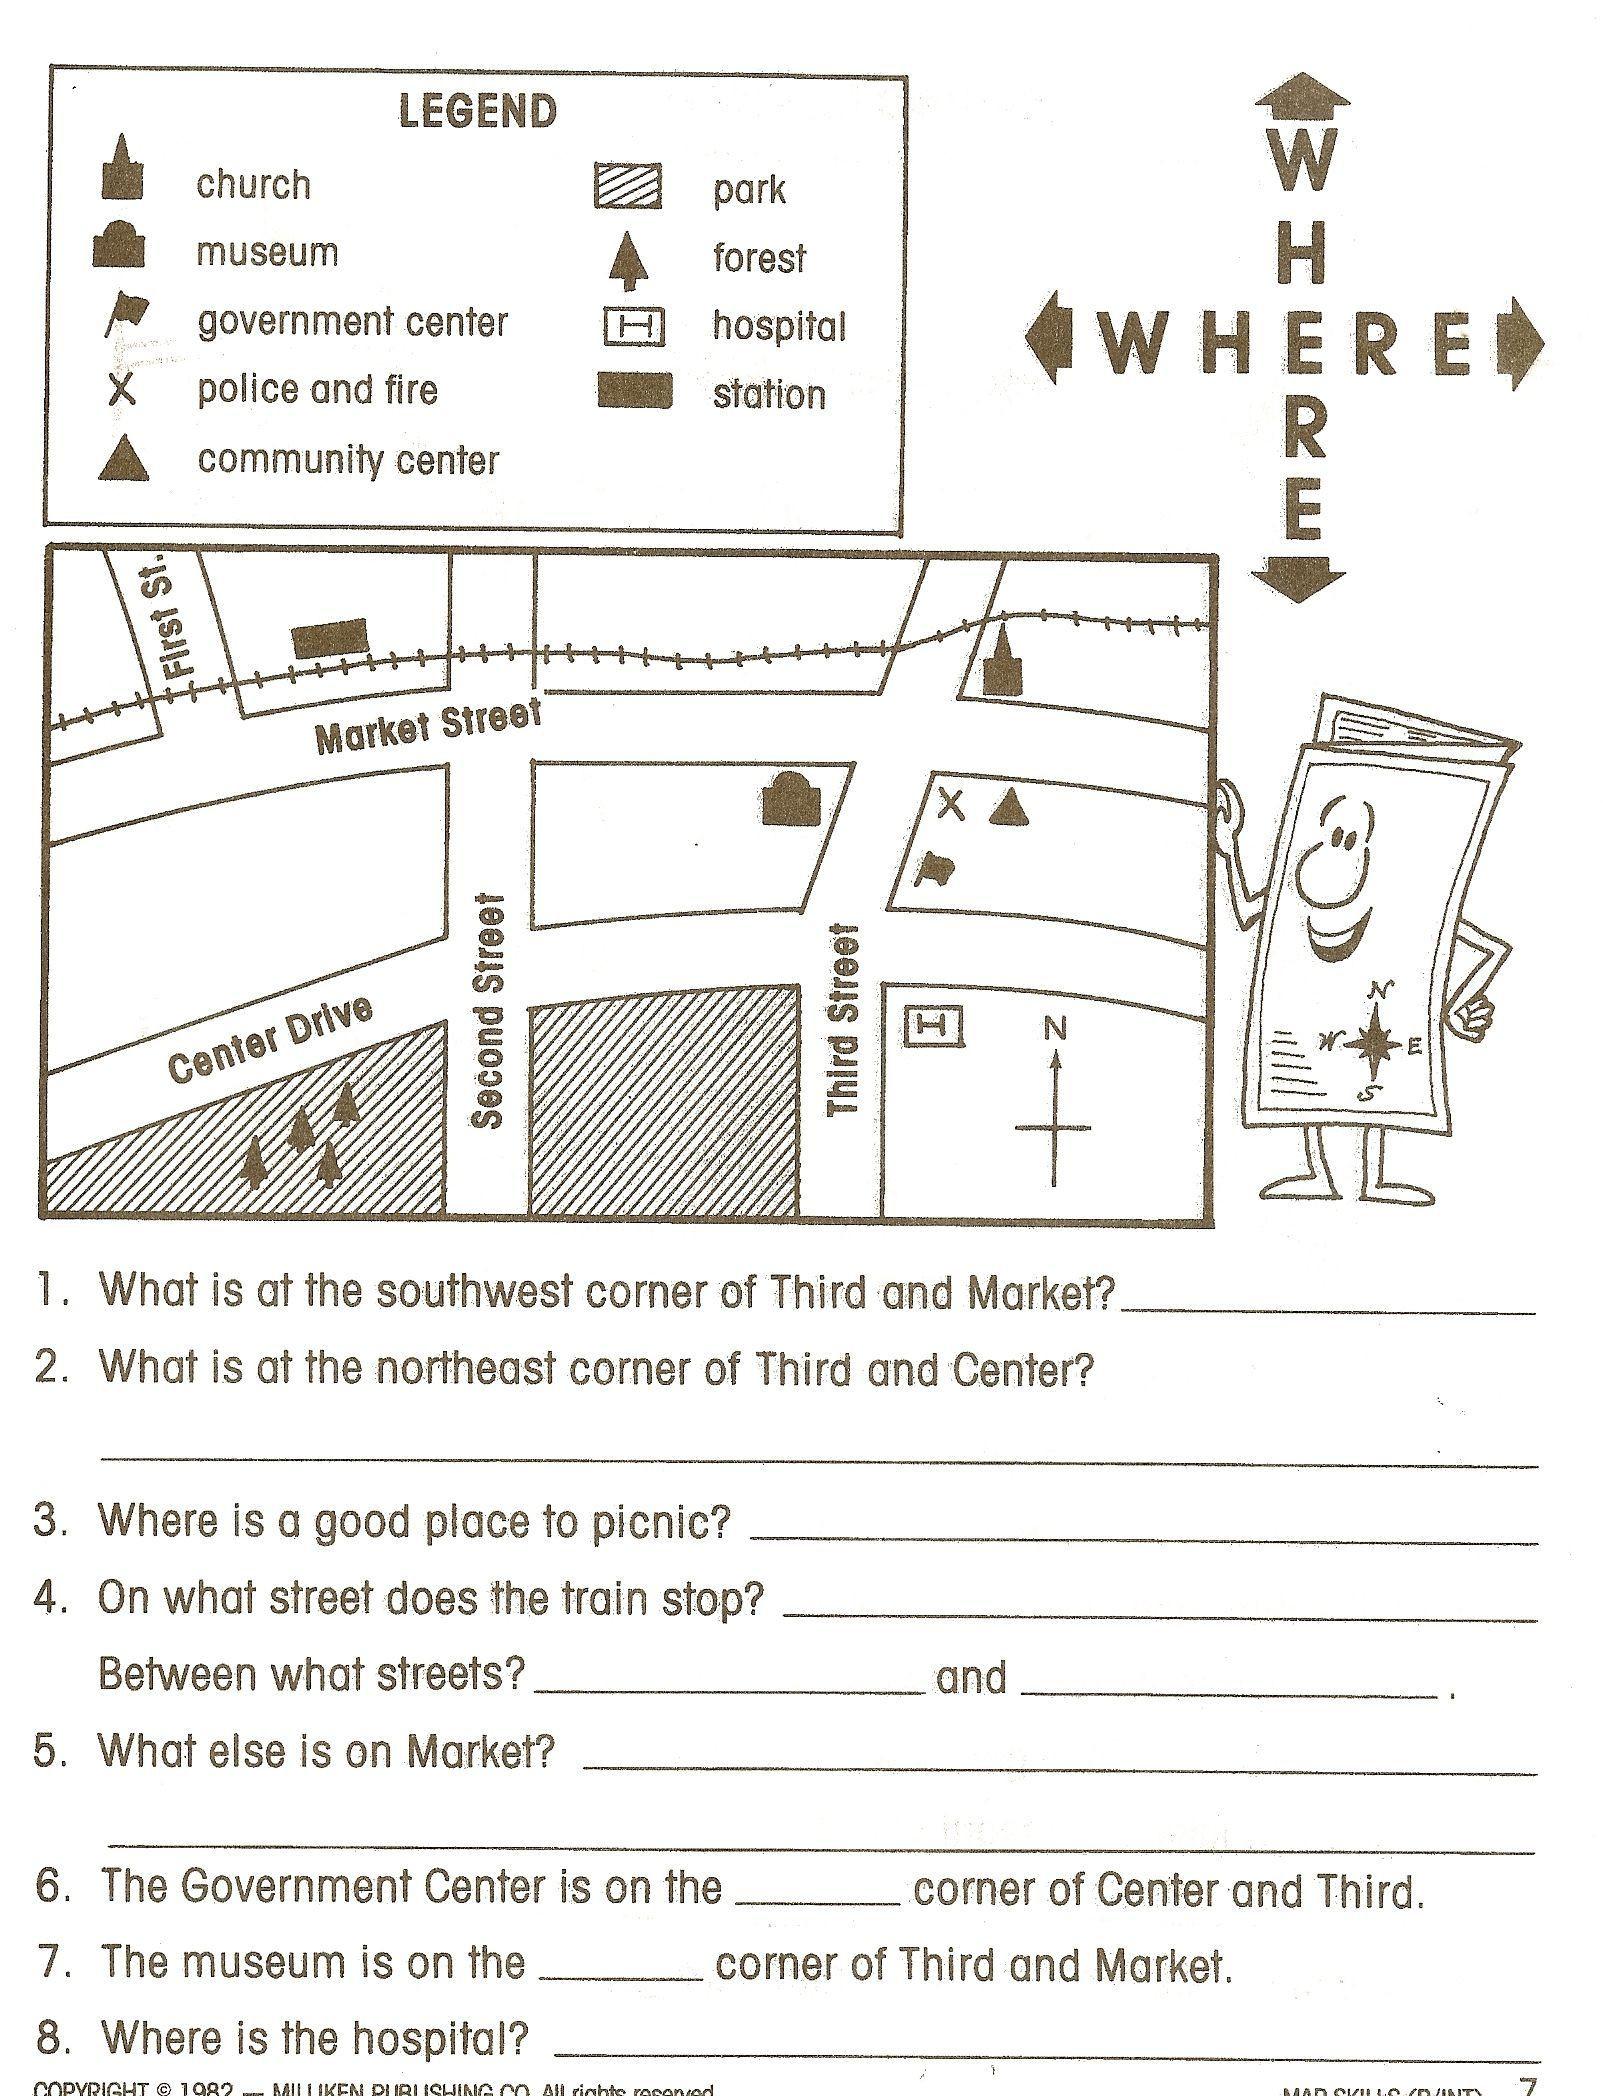 1st Grade social Studies Worksheets Free 1st Grade social Stu S Worksheets 1st